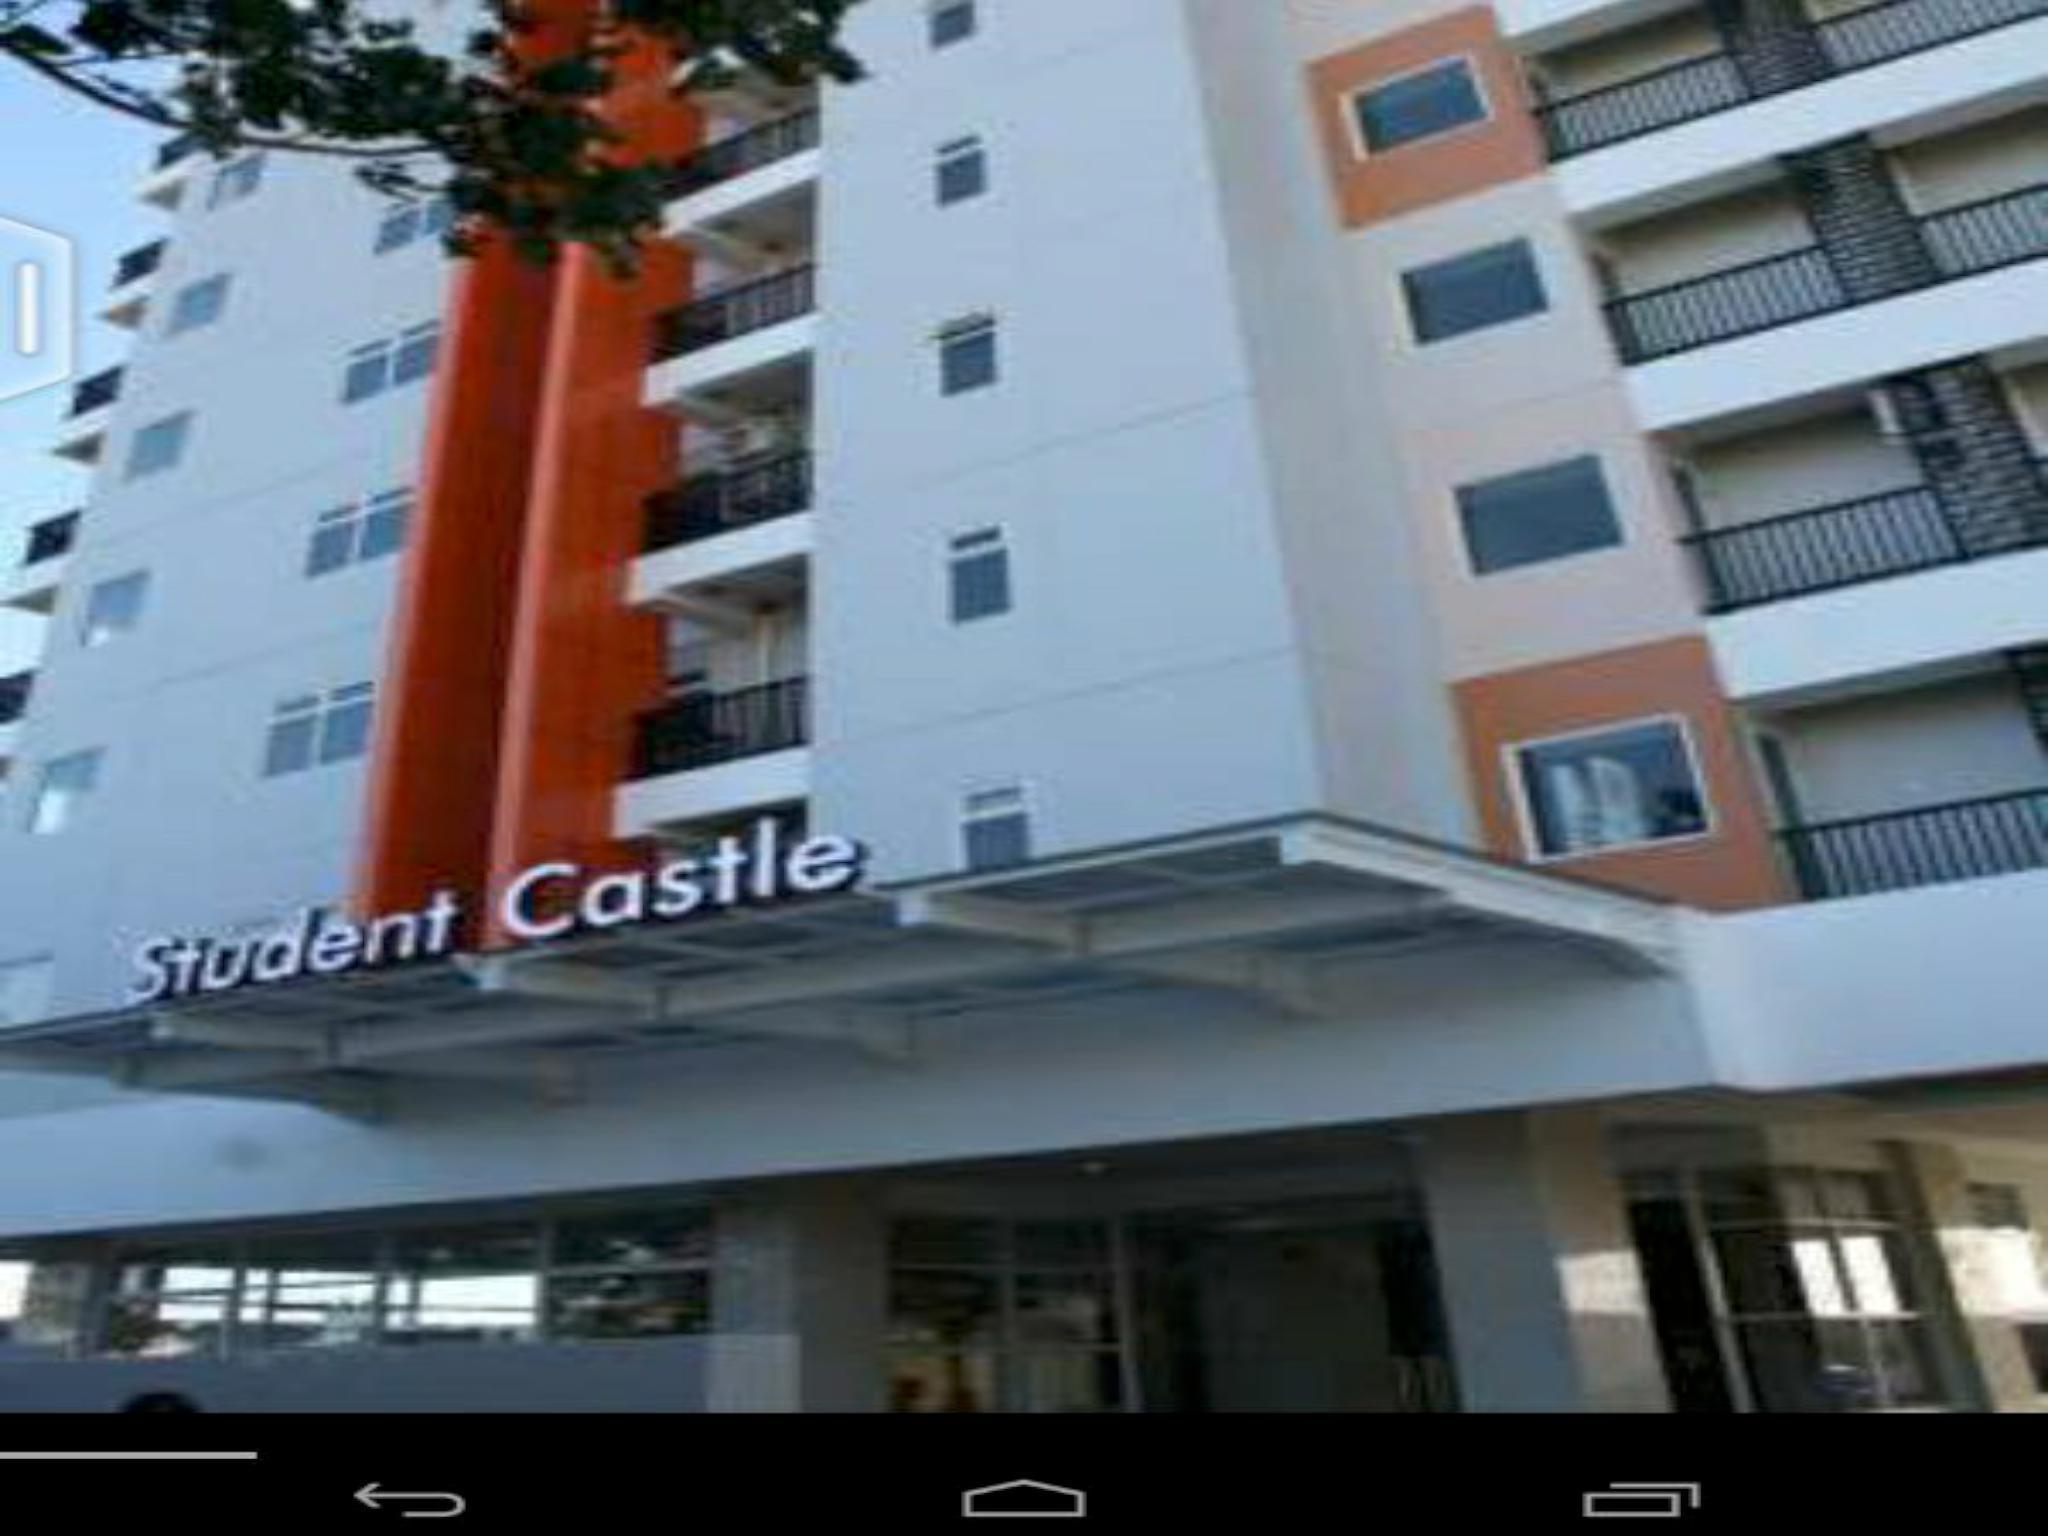 Student Castle Apartment by Vina